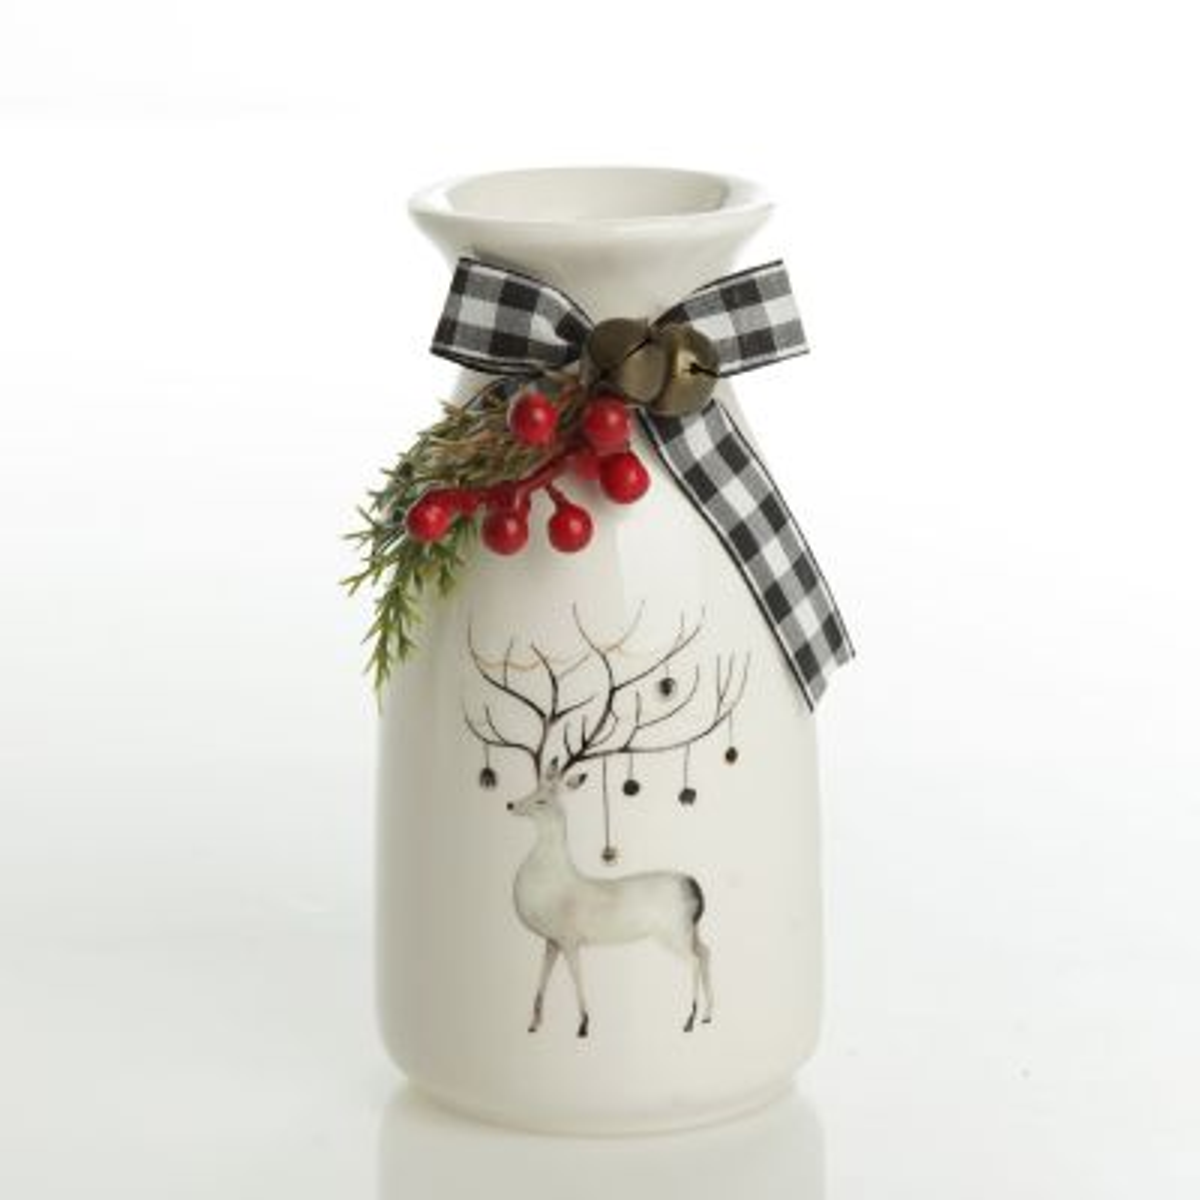 White Ceramic Milk bottle Vase with Berries - Reindeer